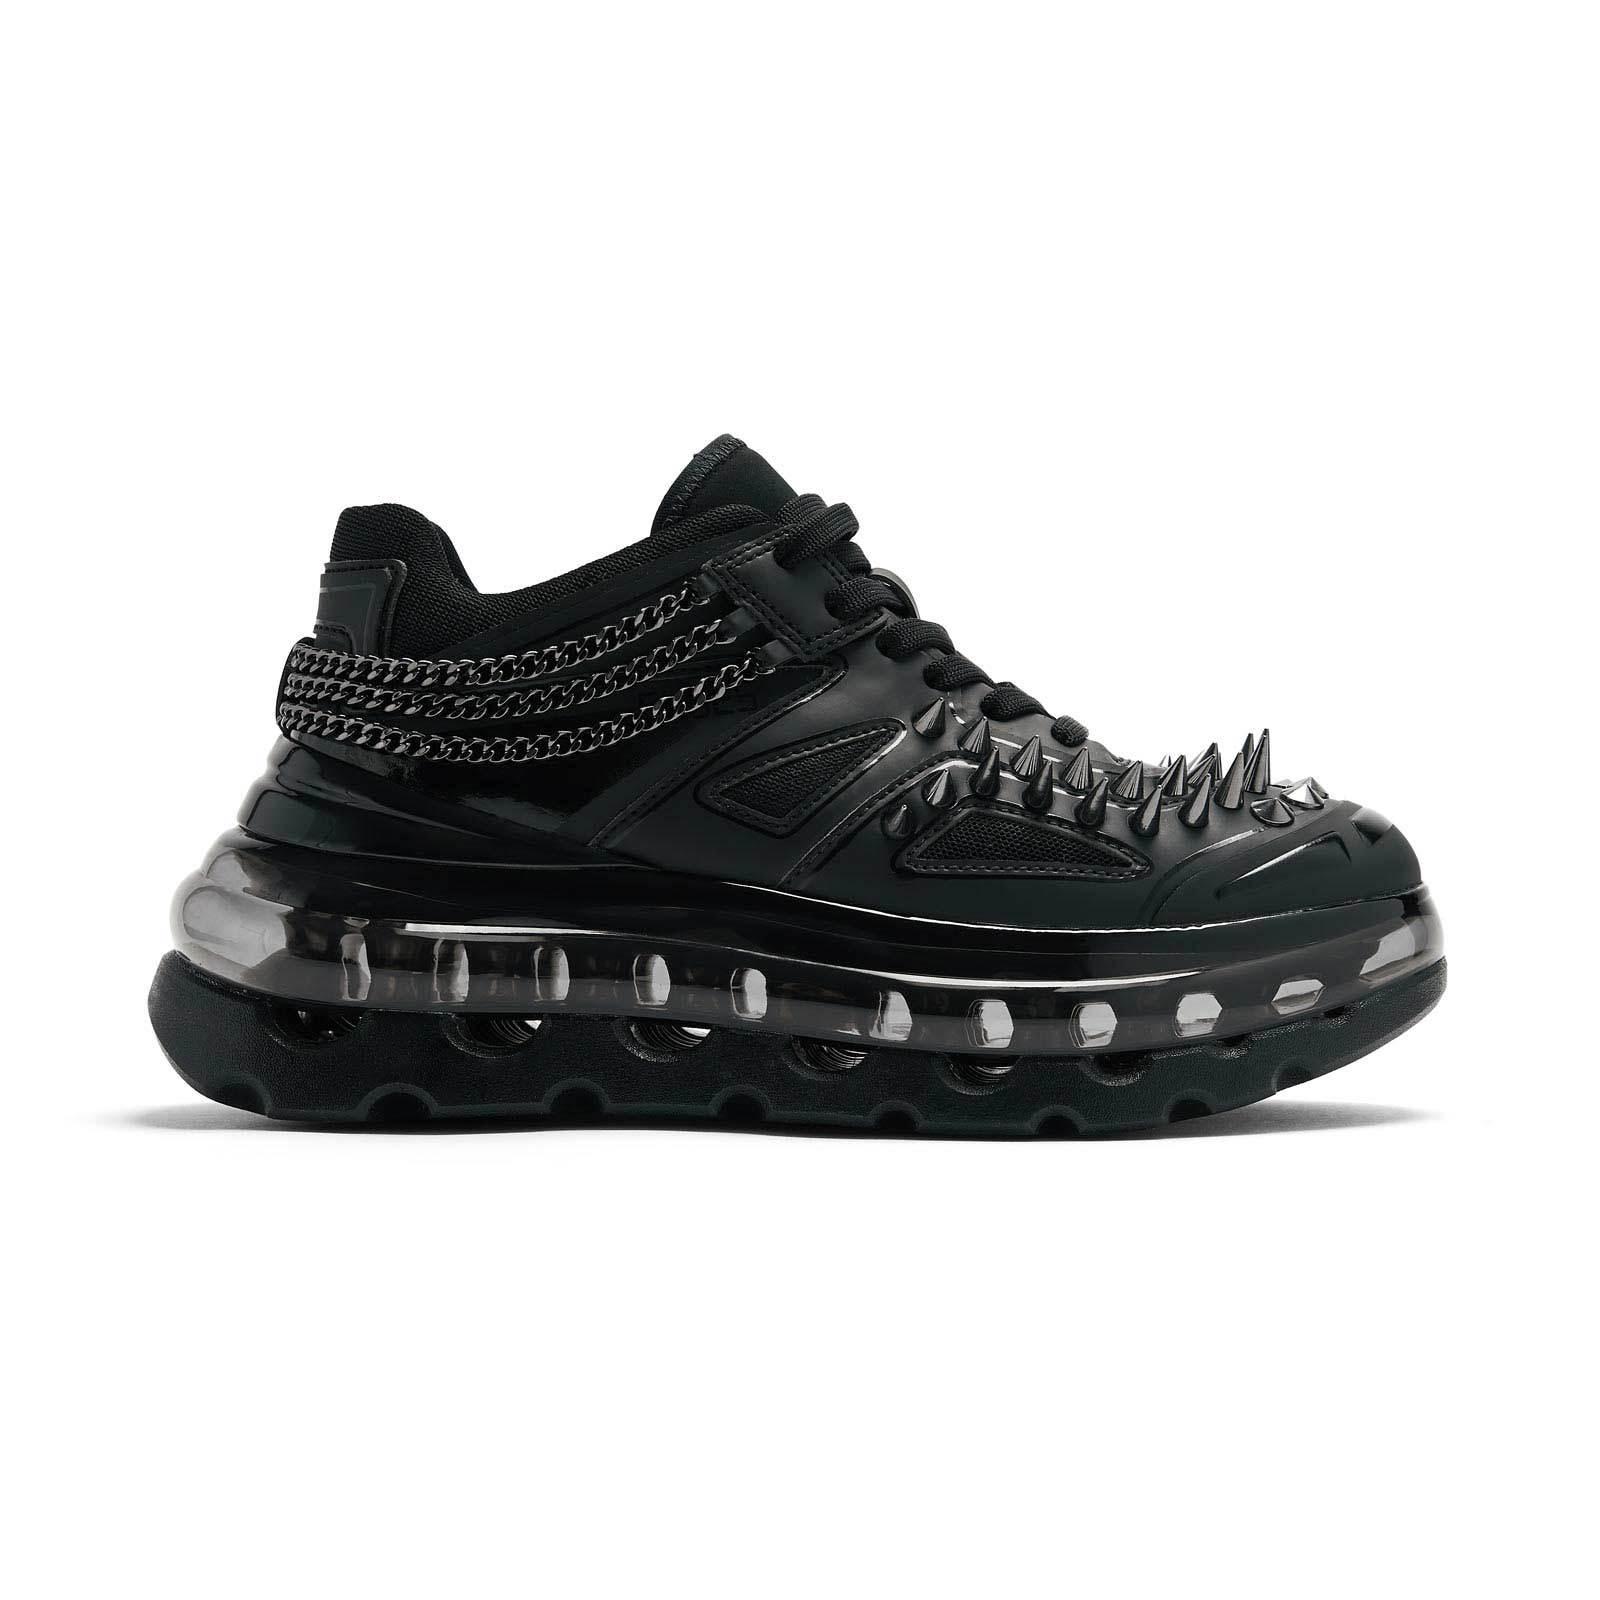 Bumpair--black-gothic-1_b3a7487e-40ca-4c43-9690-e9b4680359c1_2000x